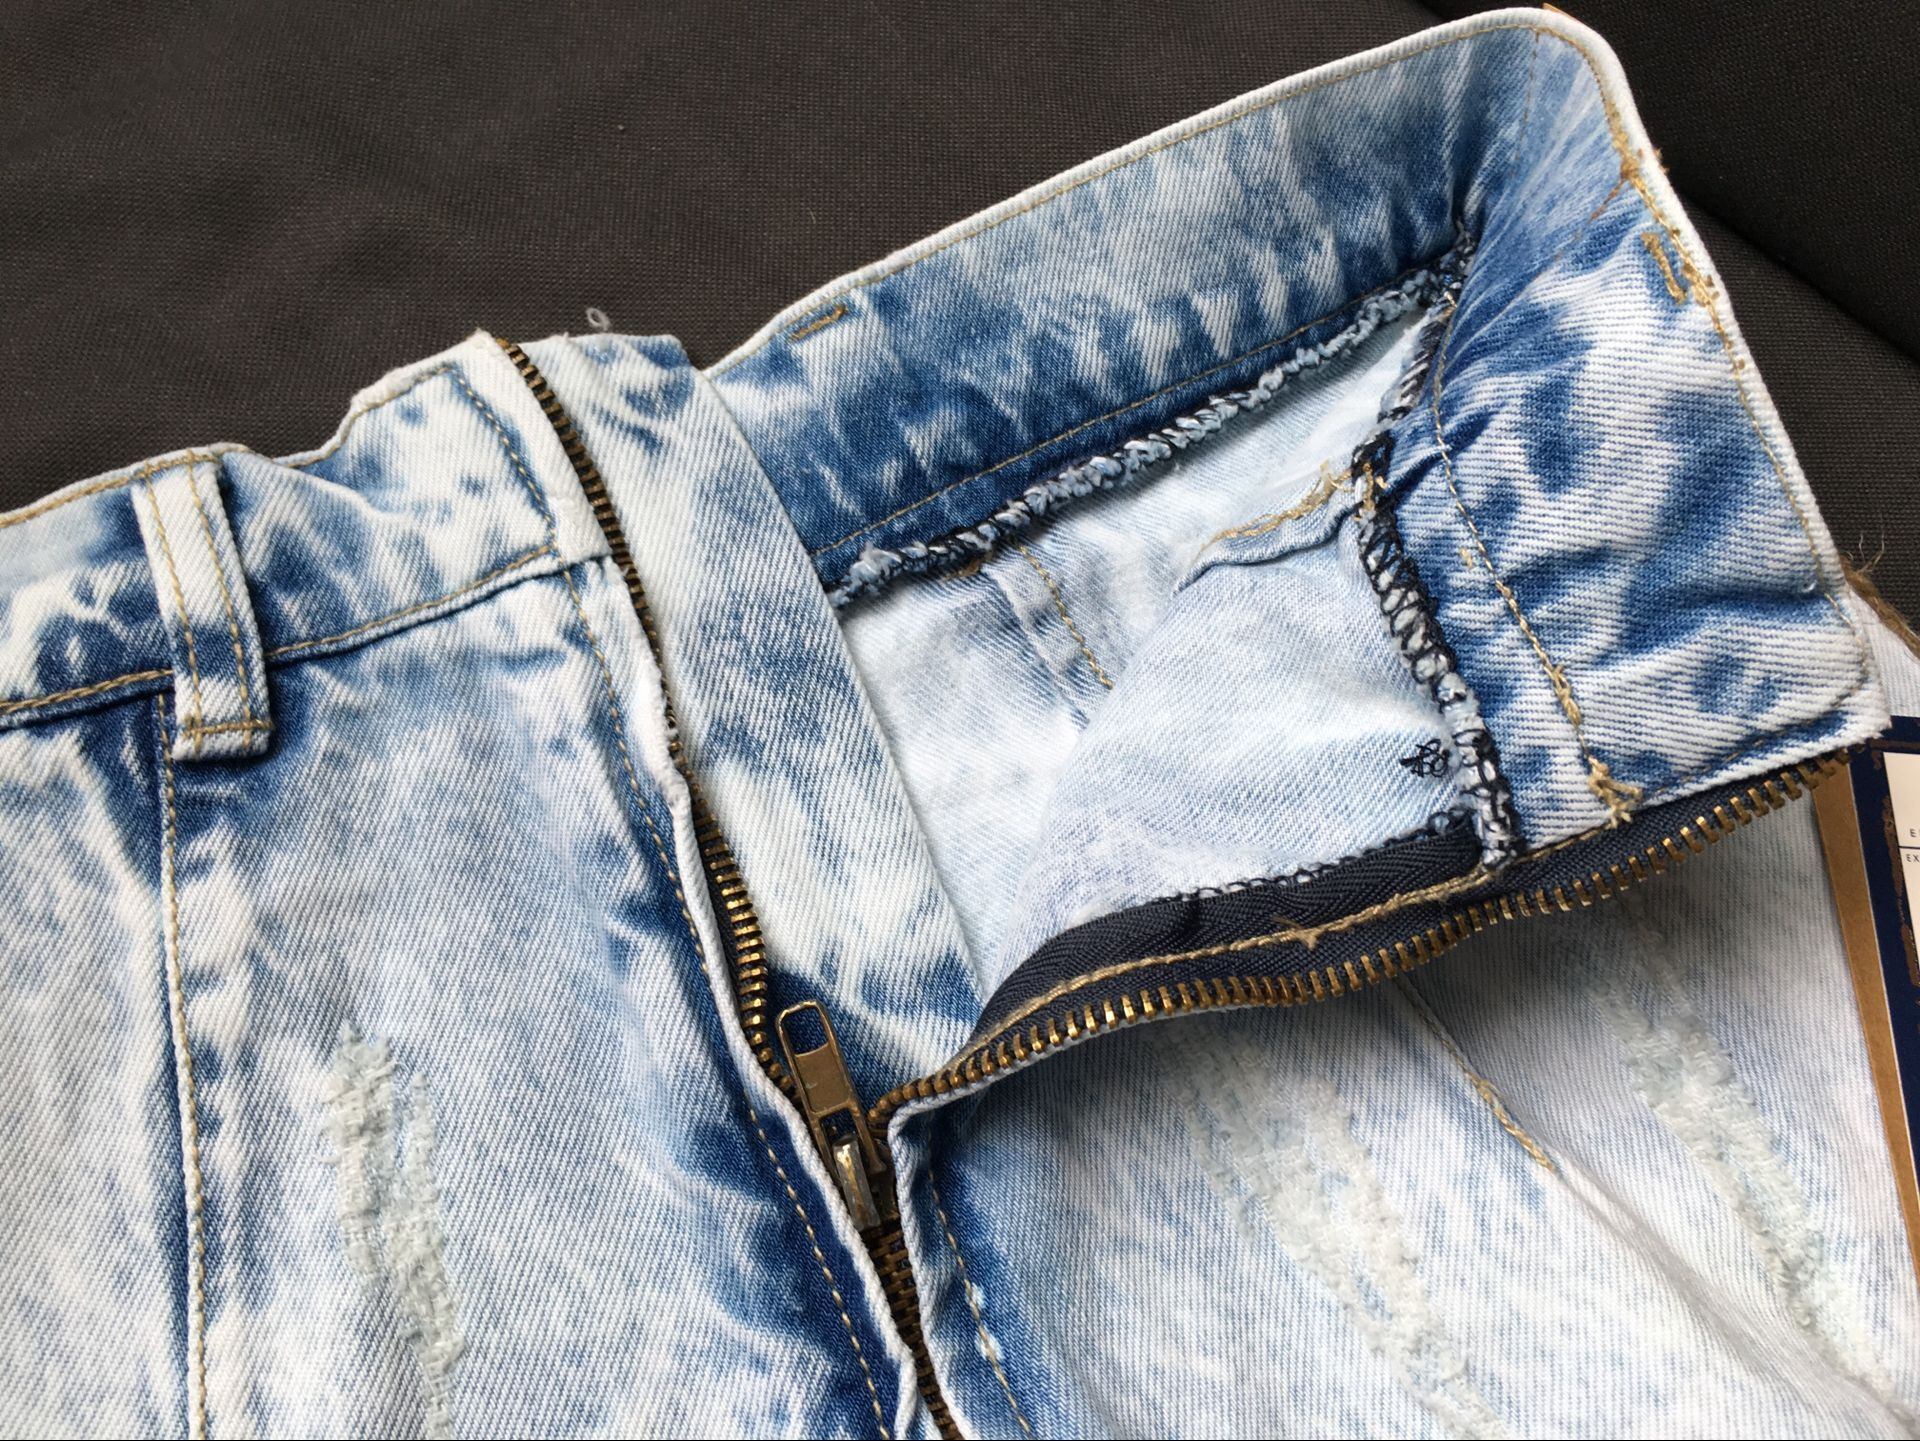 Niñas Jean Mujer Vaquera Ripped Vintage Sexy Azul Verano Mujeres Casual Falda Damas Para 2018 Moda aqwxv1x